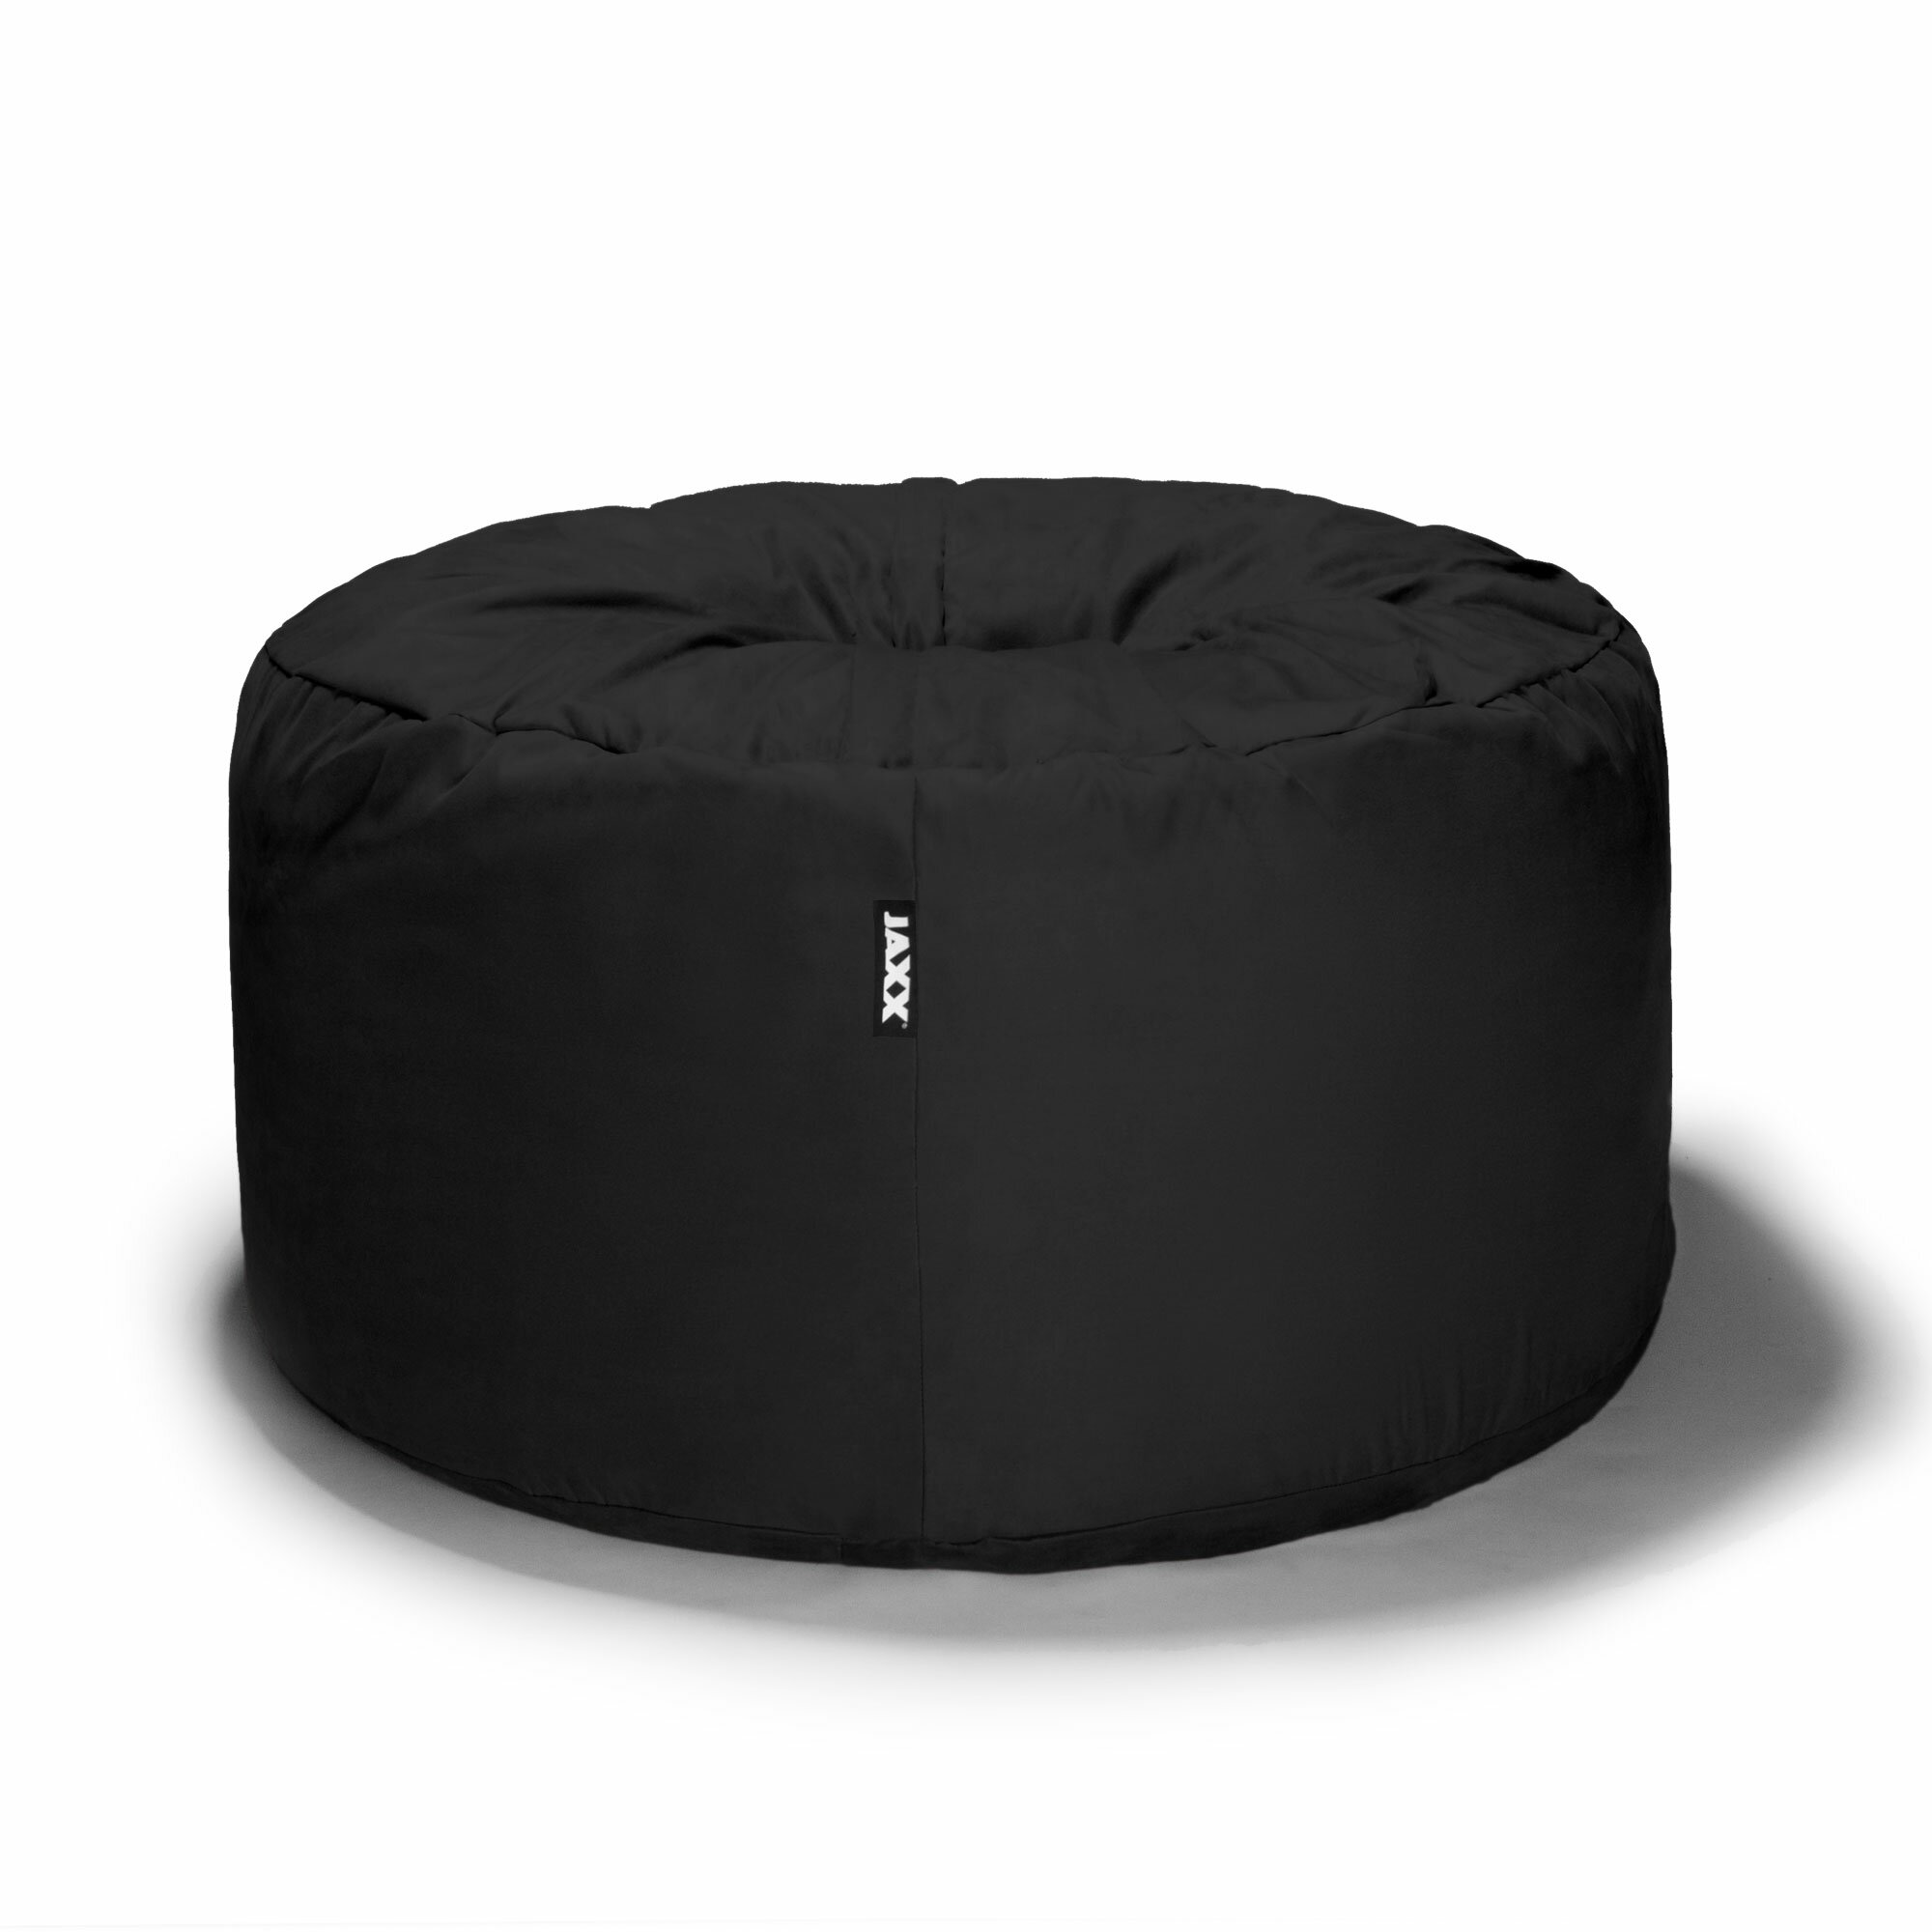 jaxx large bean bag gaming chair reviews wayfair. Black Bedroom Furniture Sets. Home Design Ideas